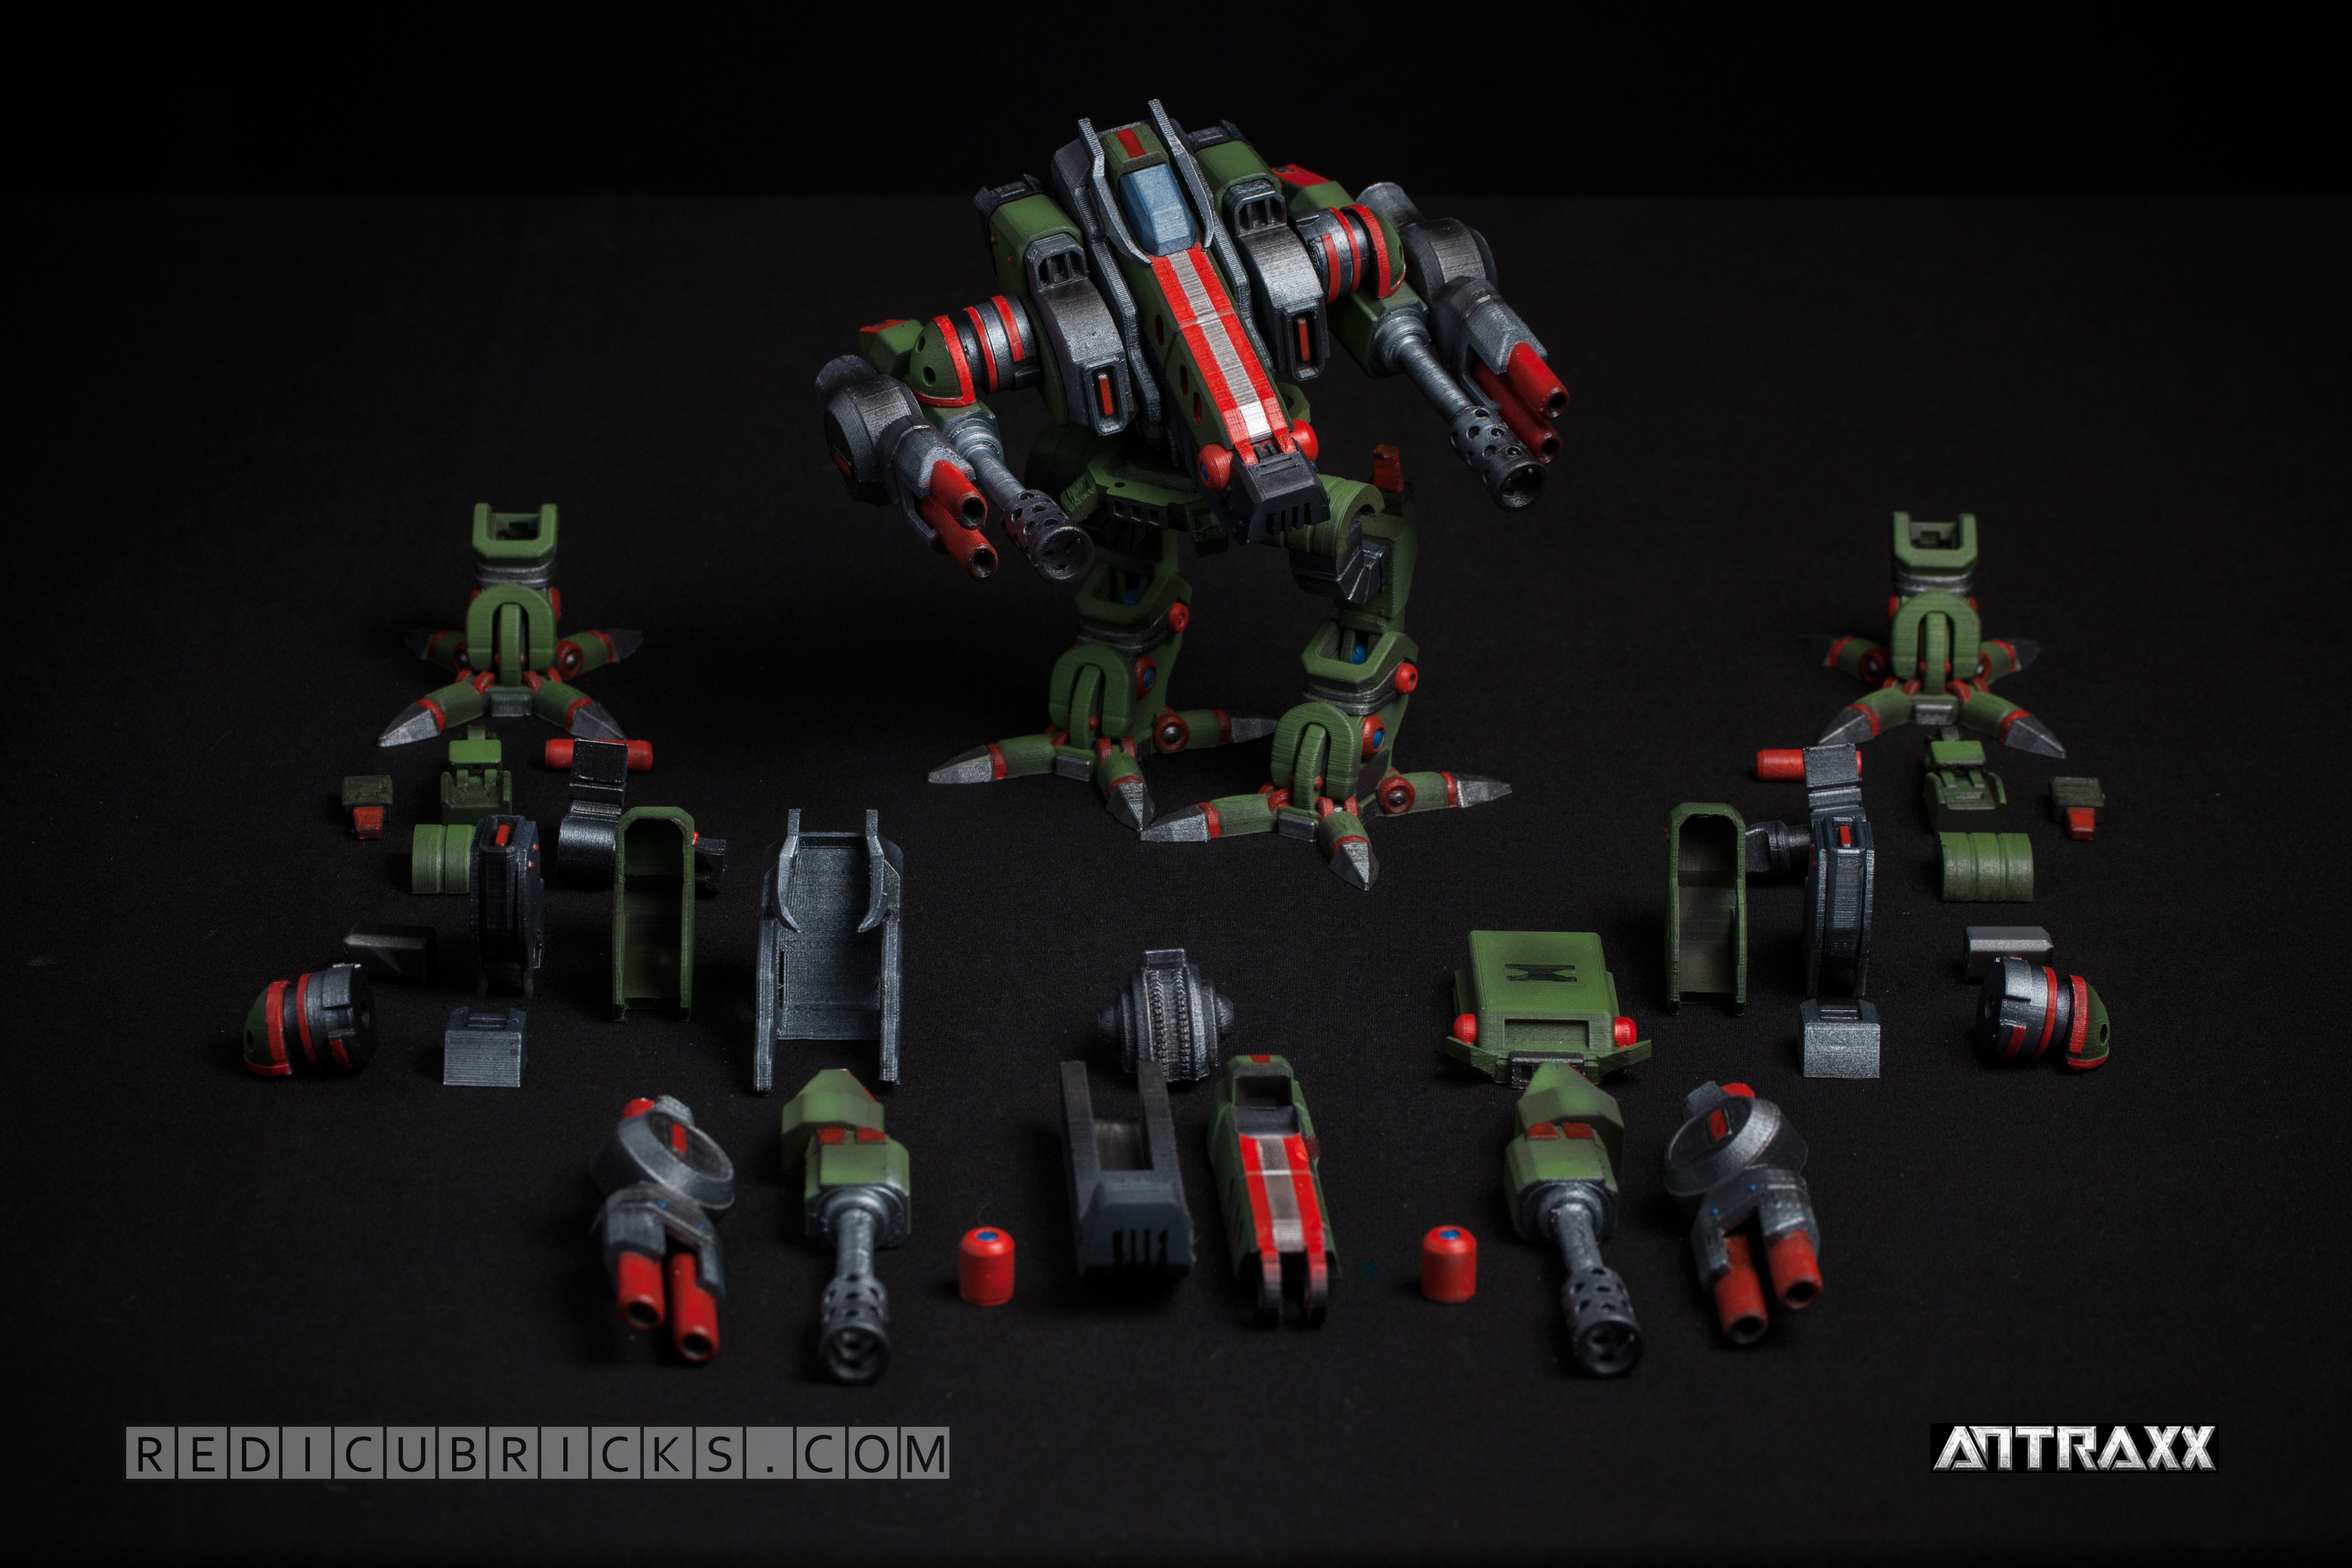 antraxx redicubricks 3